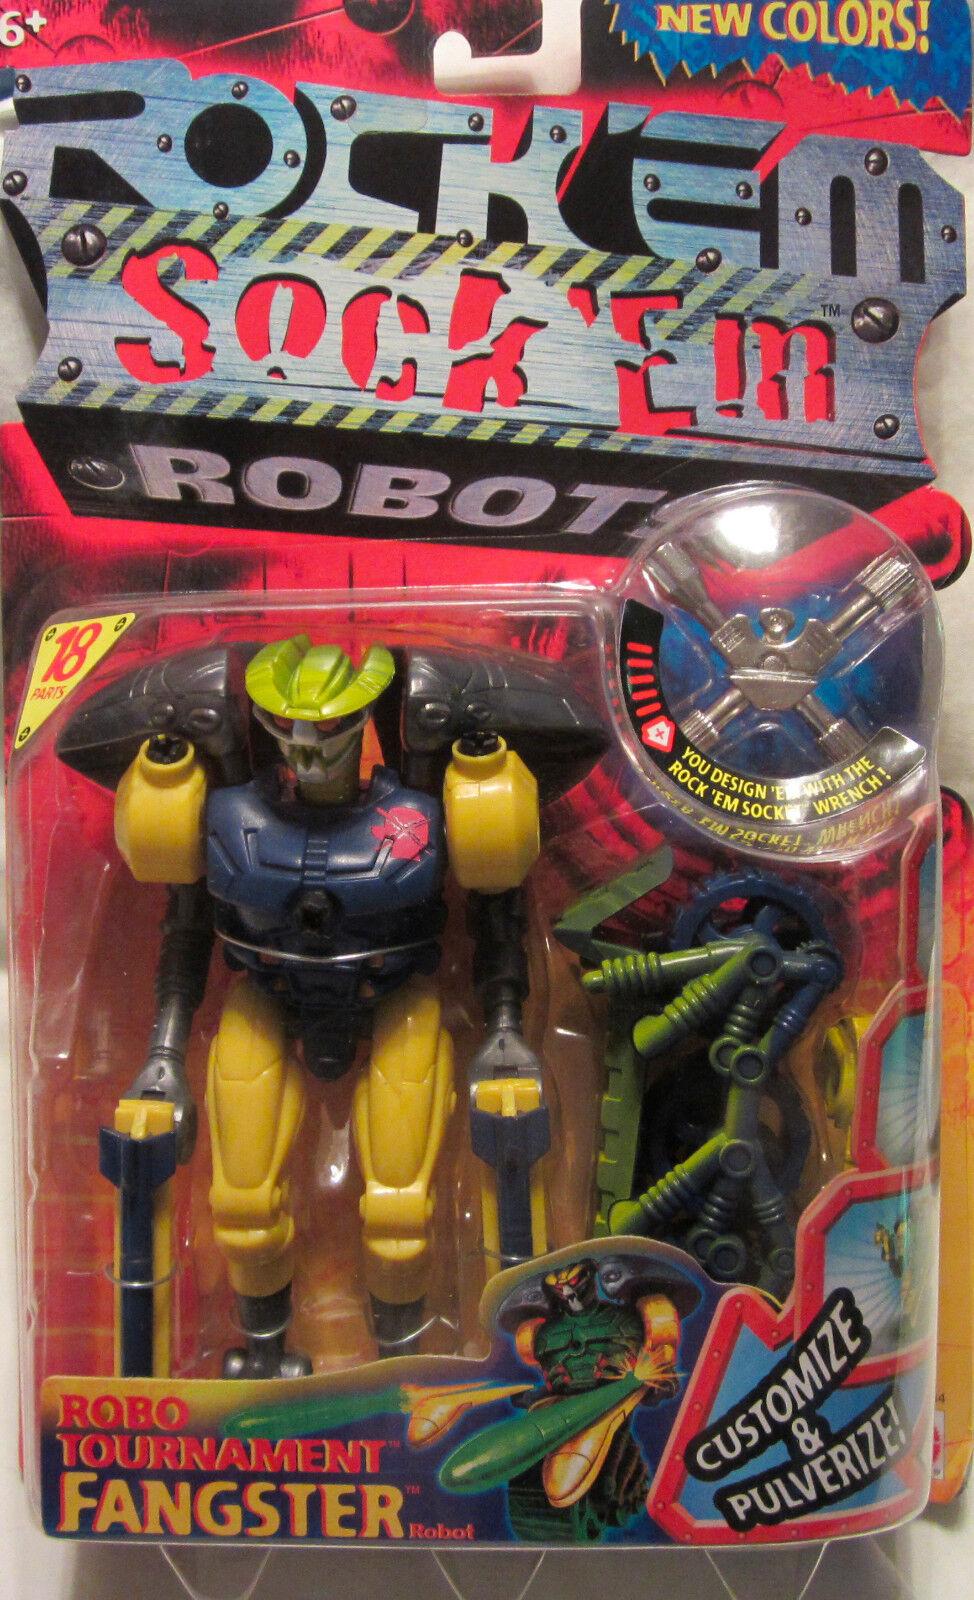 Rock 'em Calcetín 'em Robots Robo Torneo Fangster 2001 Mattel Nuevo